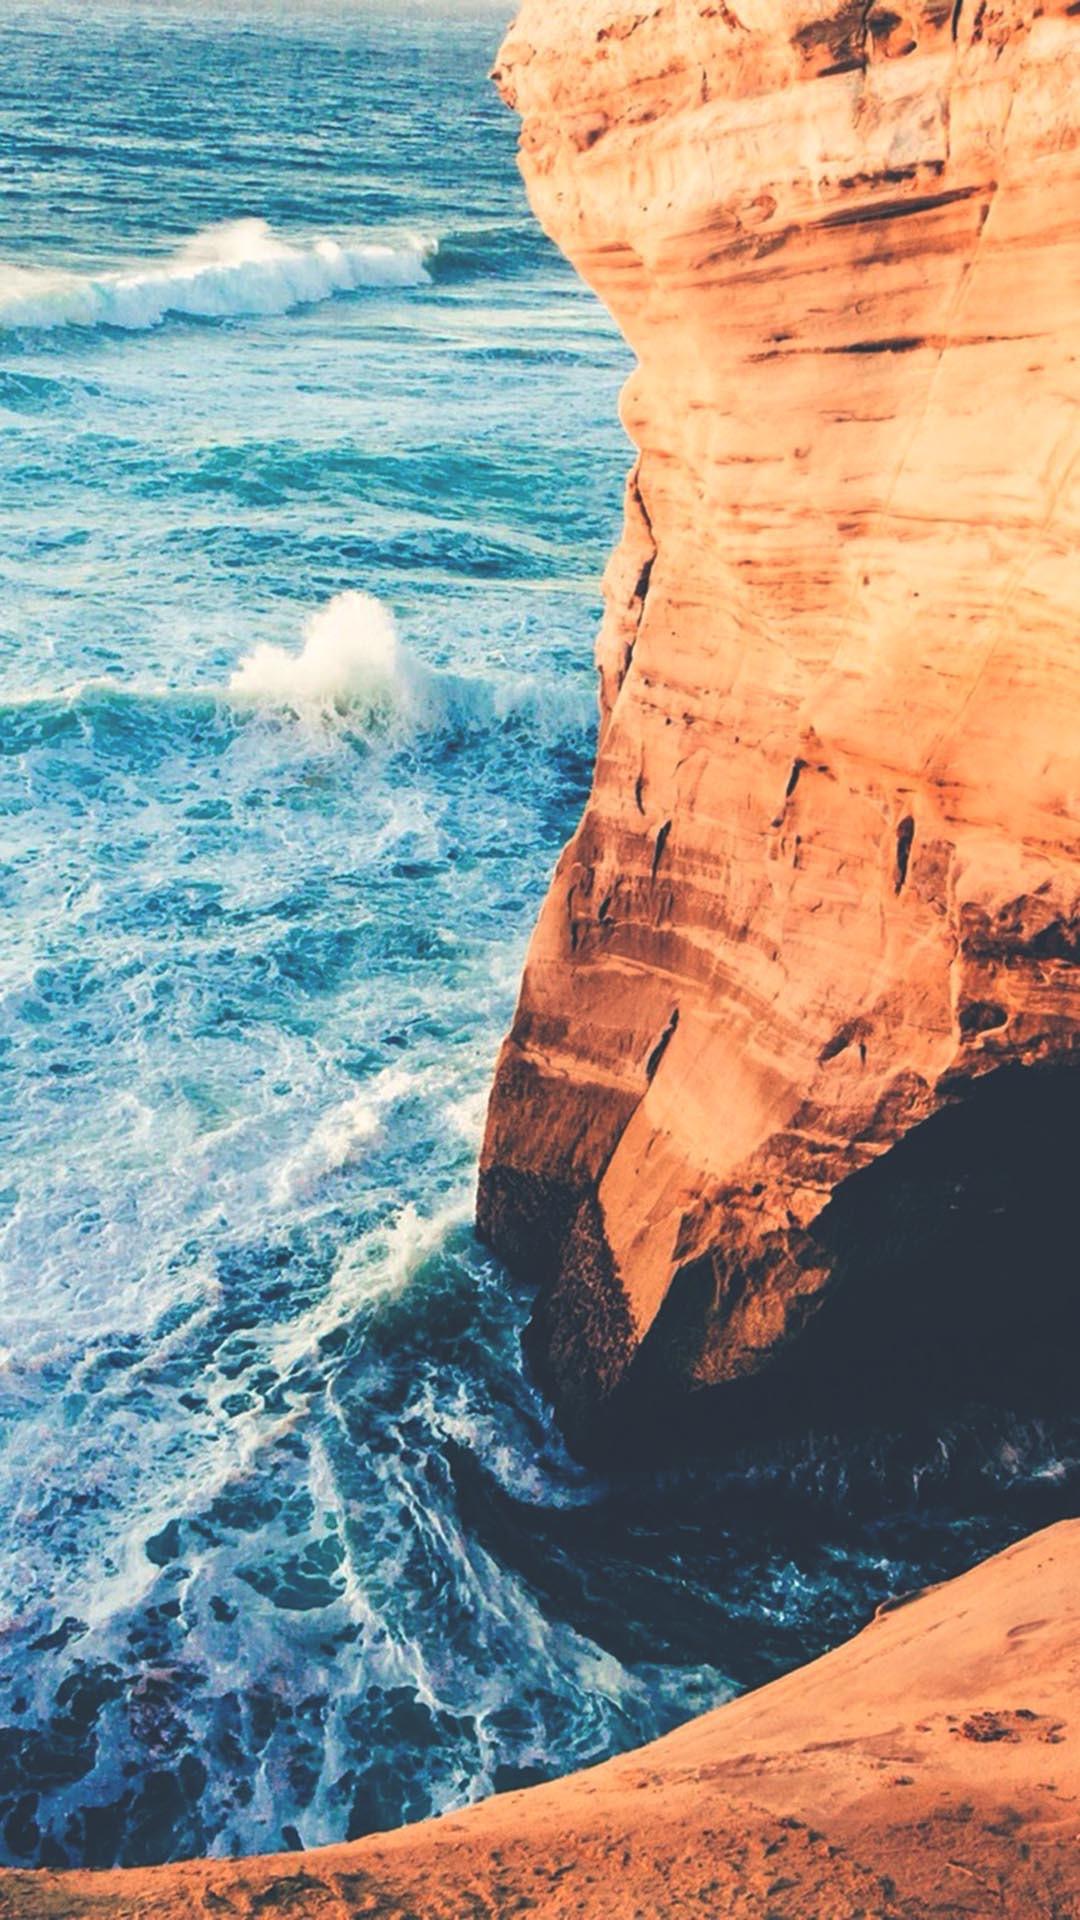 Wallpaper Wednesday Sea